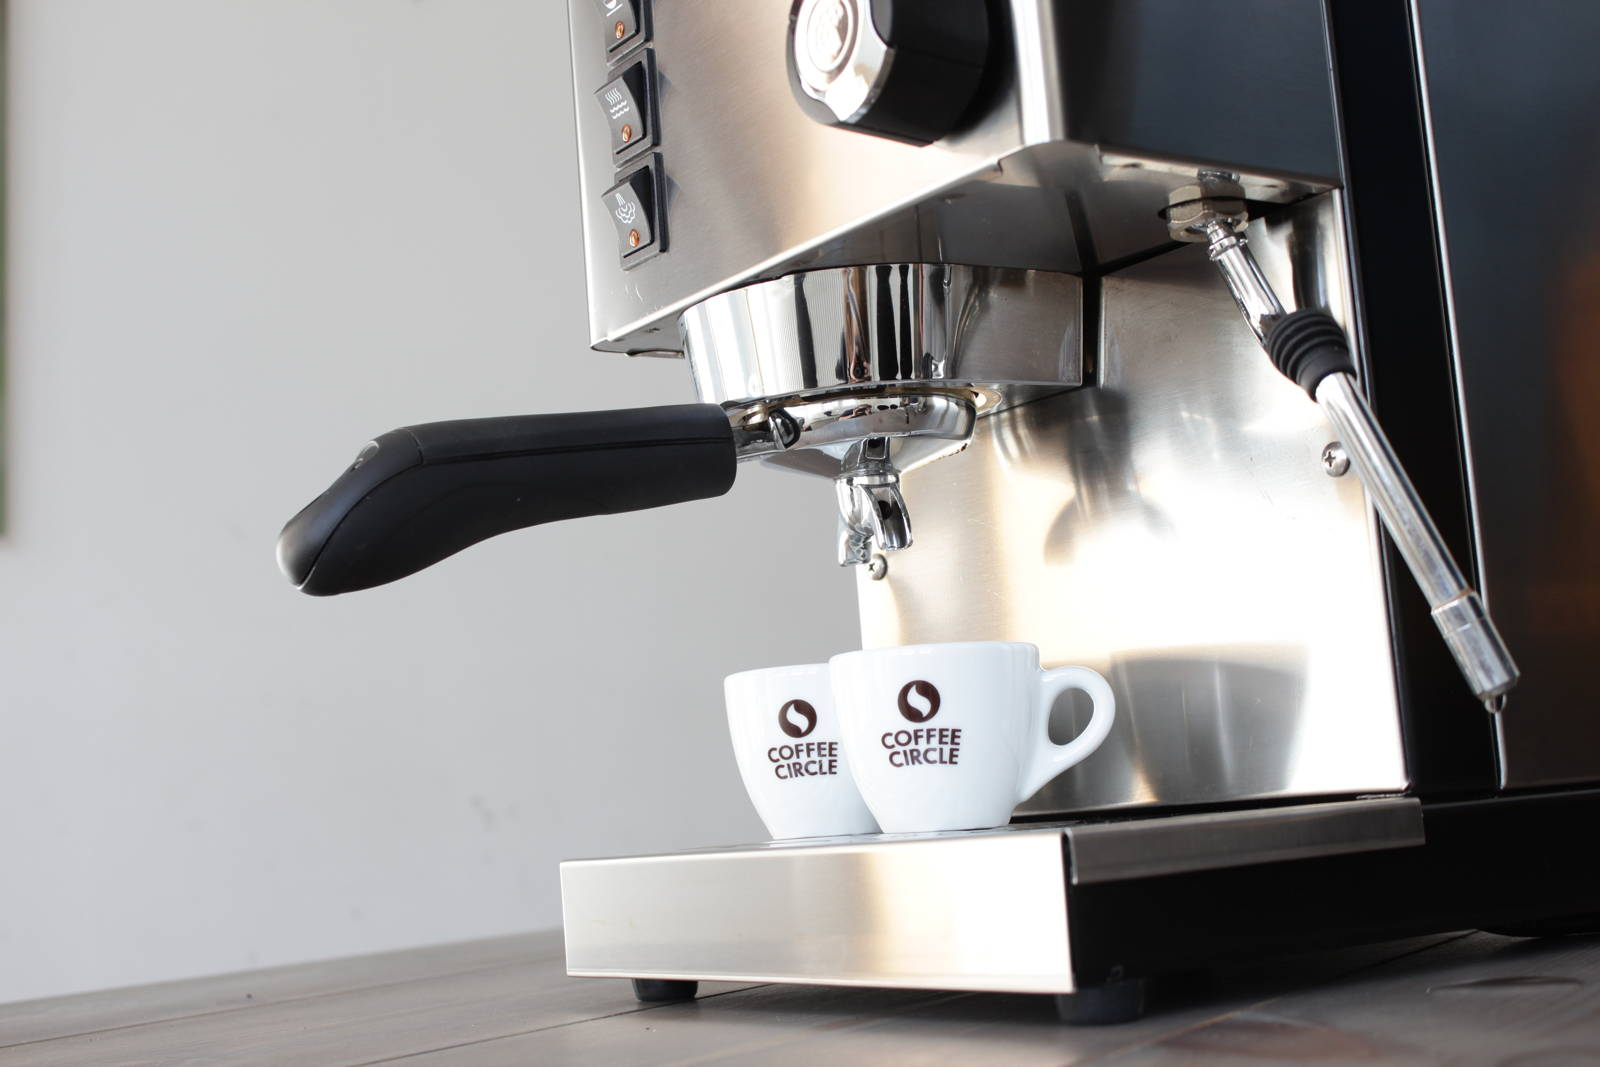 bedienungsanleitung der rancilio silvia coffee circle. Black Bedroom Furniture Sets. Home Design Ideas